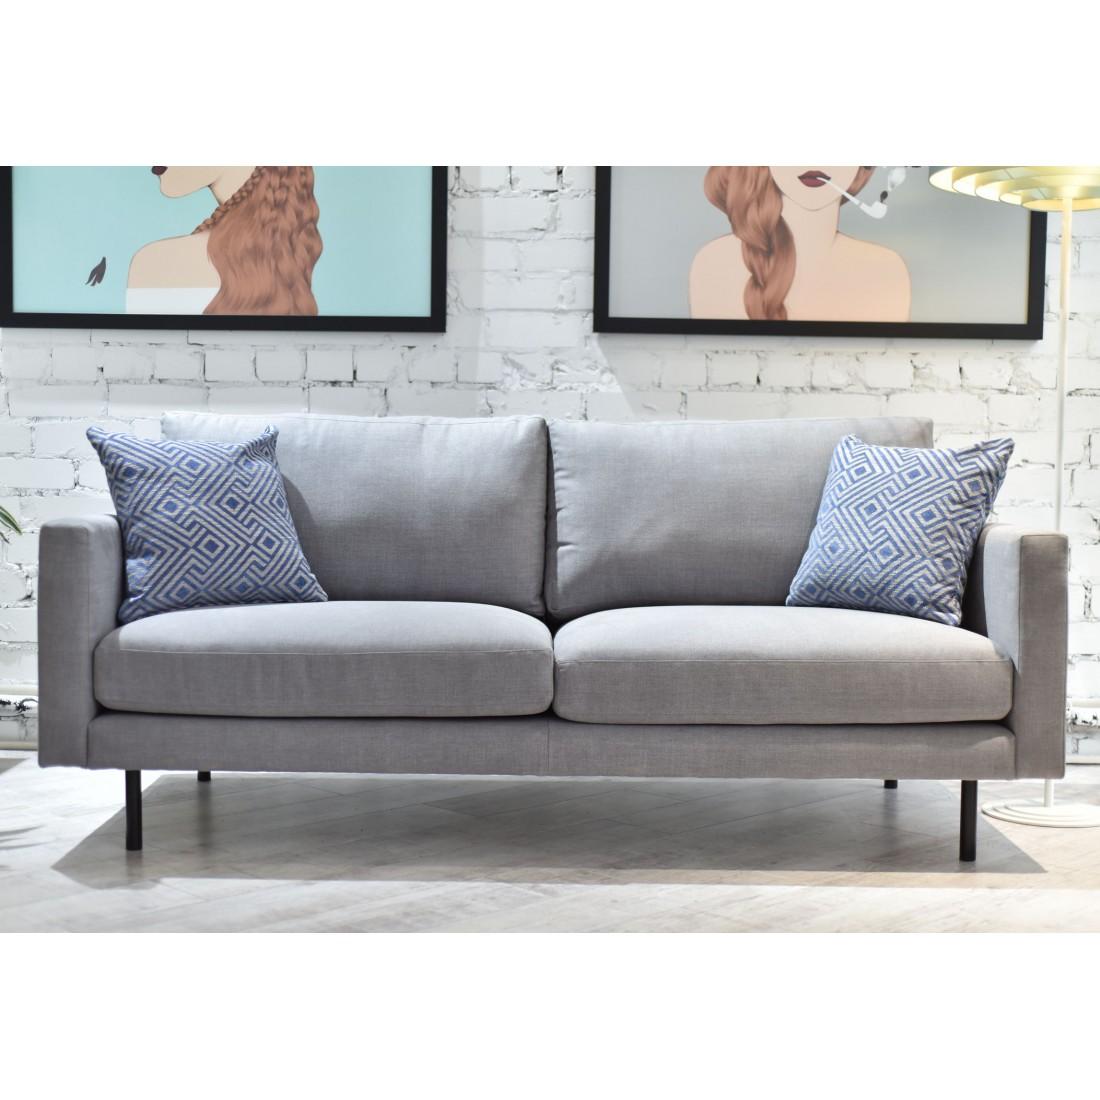 Turku 3,5-seater sofa